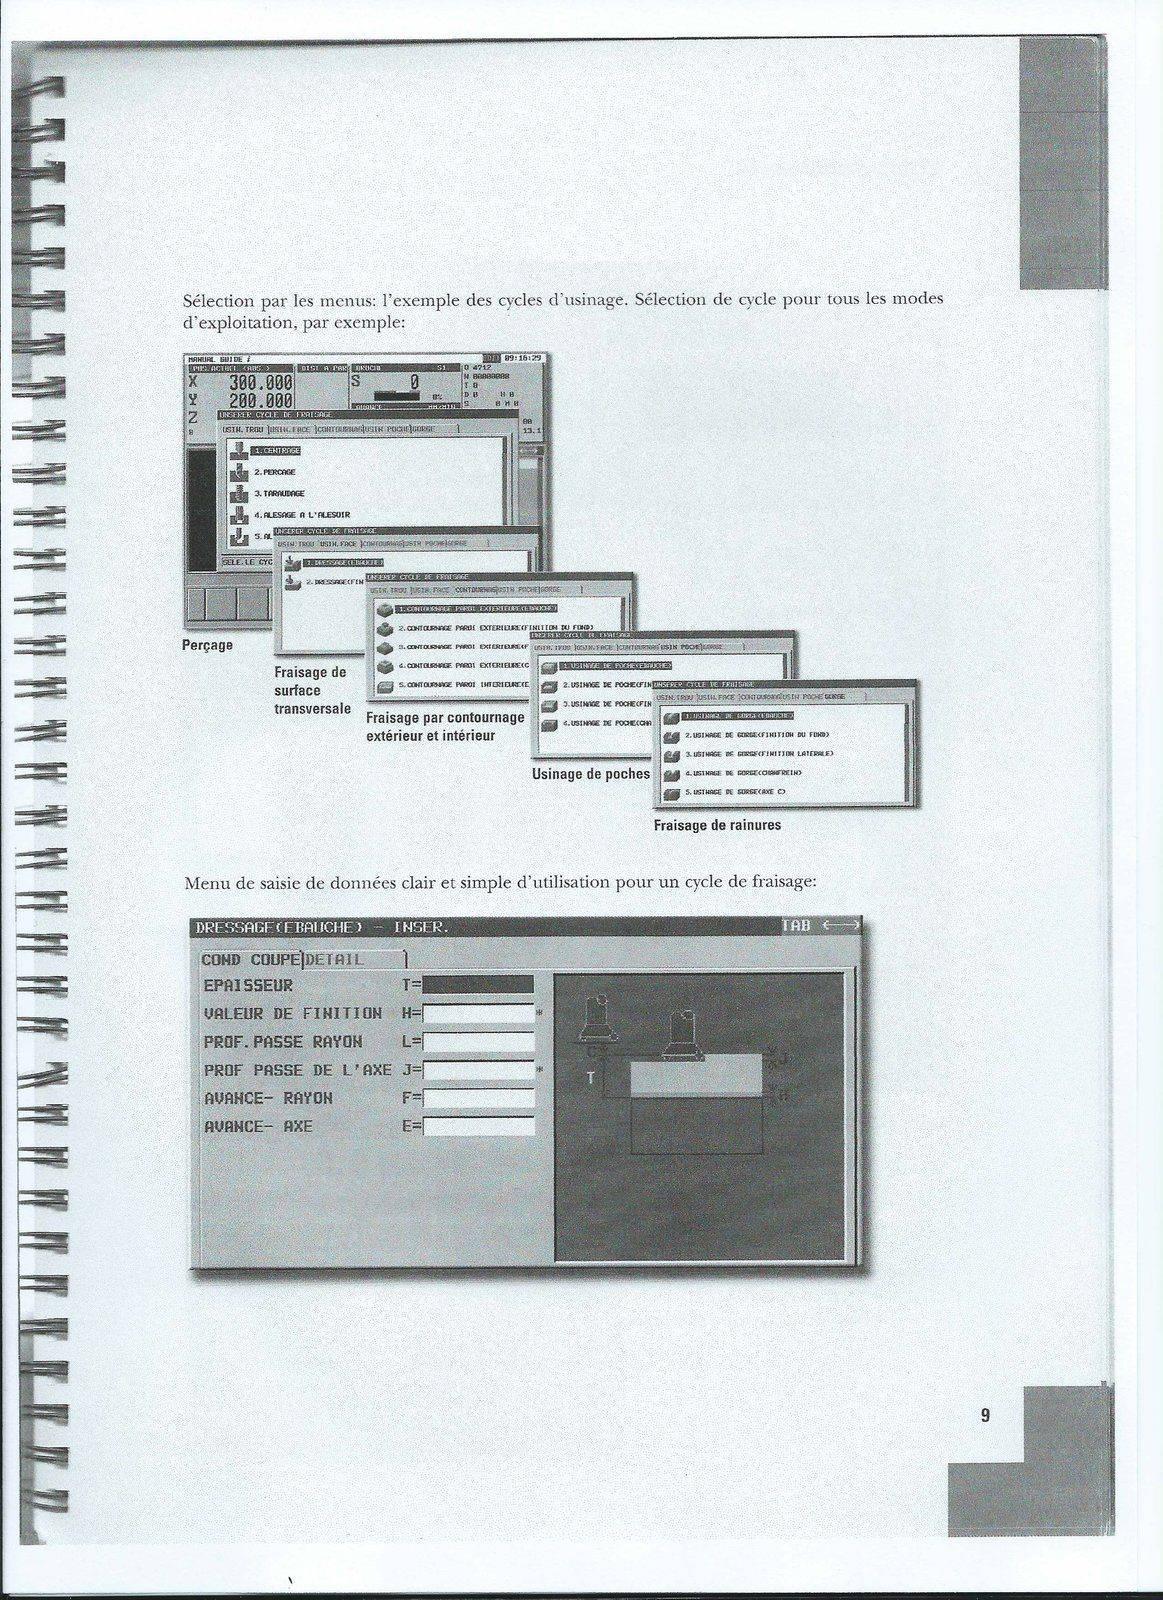 manuel guide 5.jpg